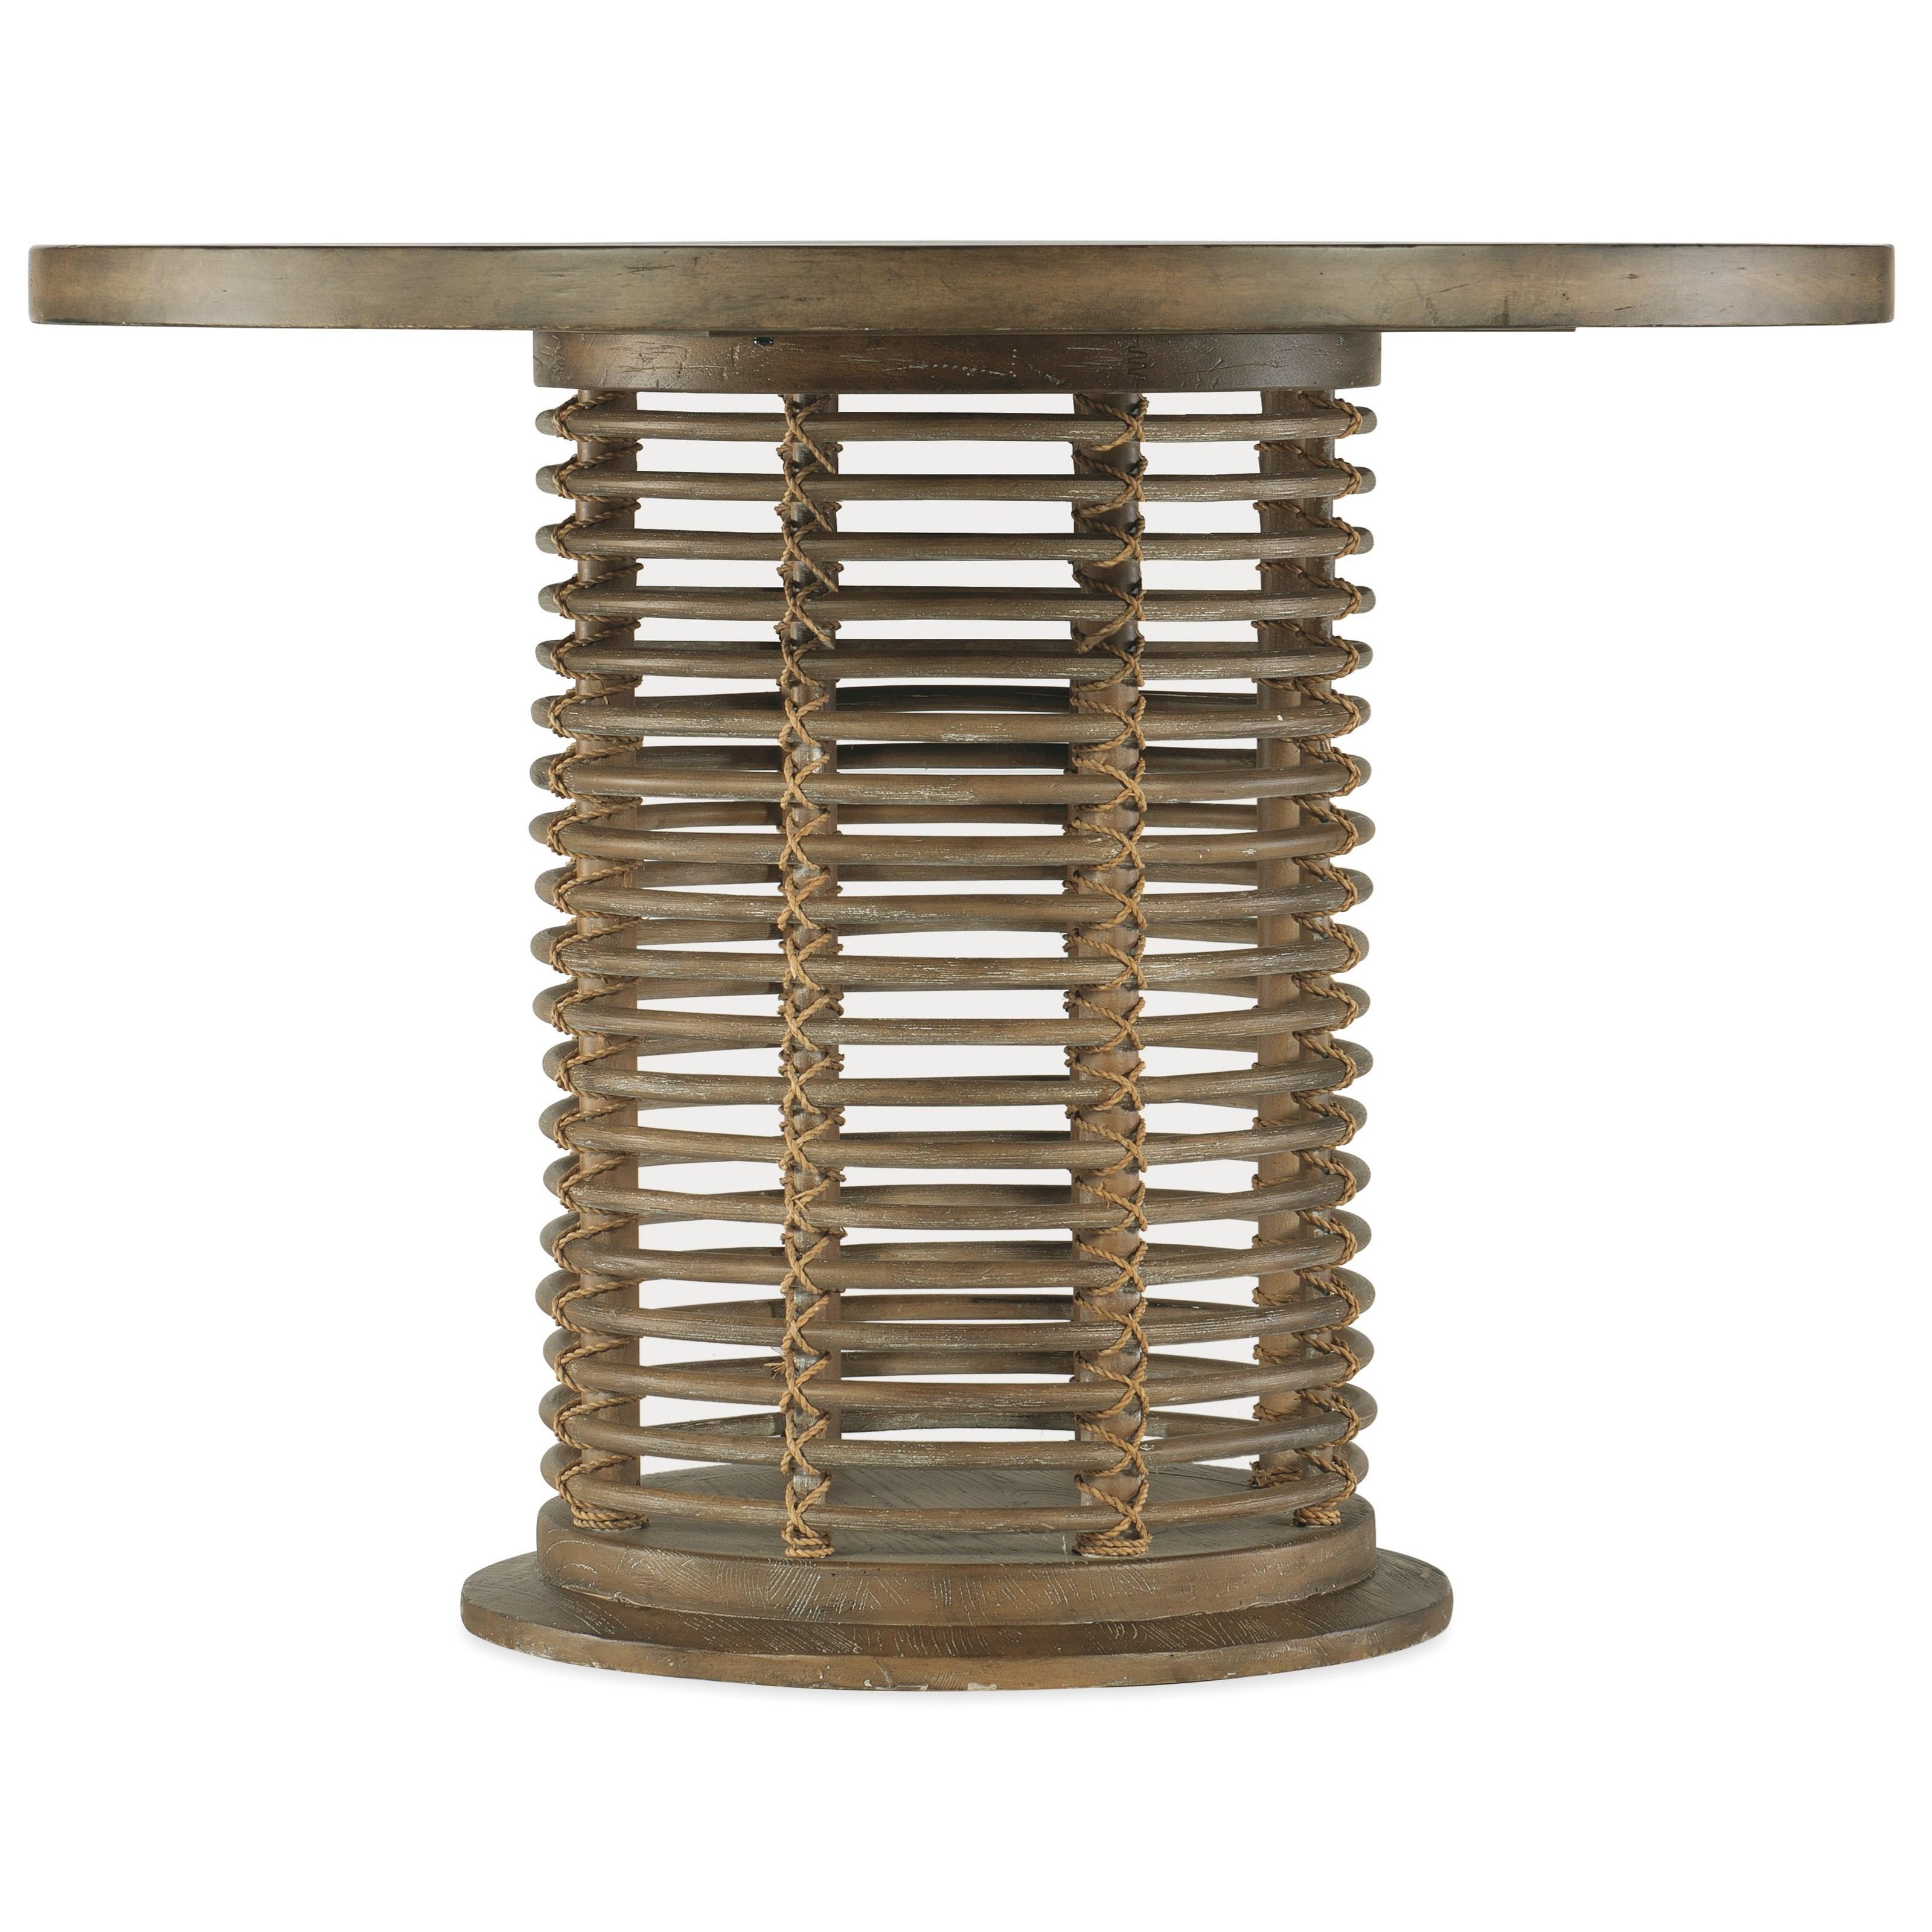 "Sundance 48"" Round Bistro Table by Hooker Furniture at Baer's Furniture"